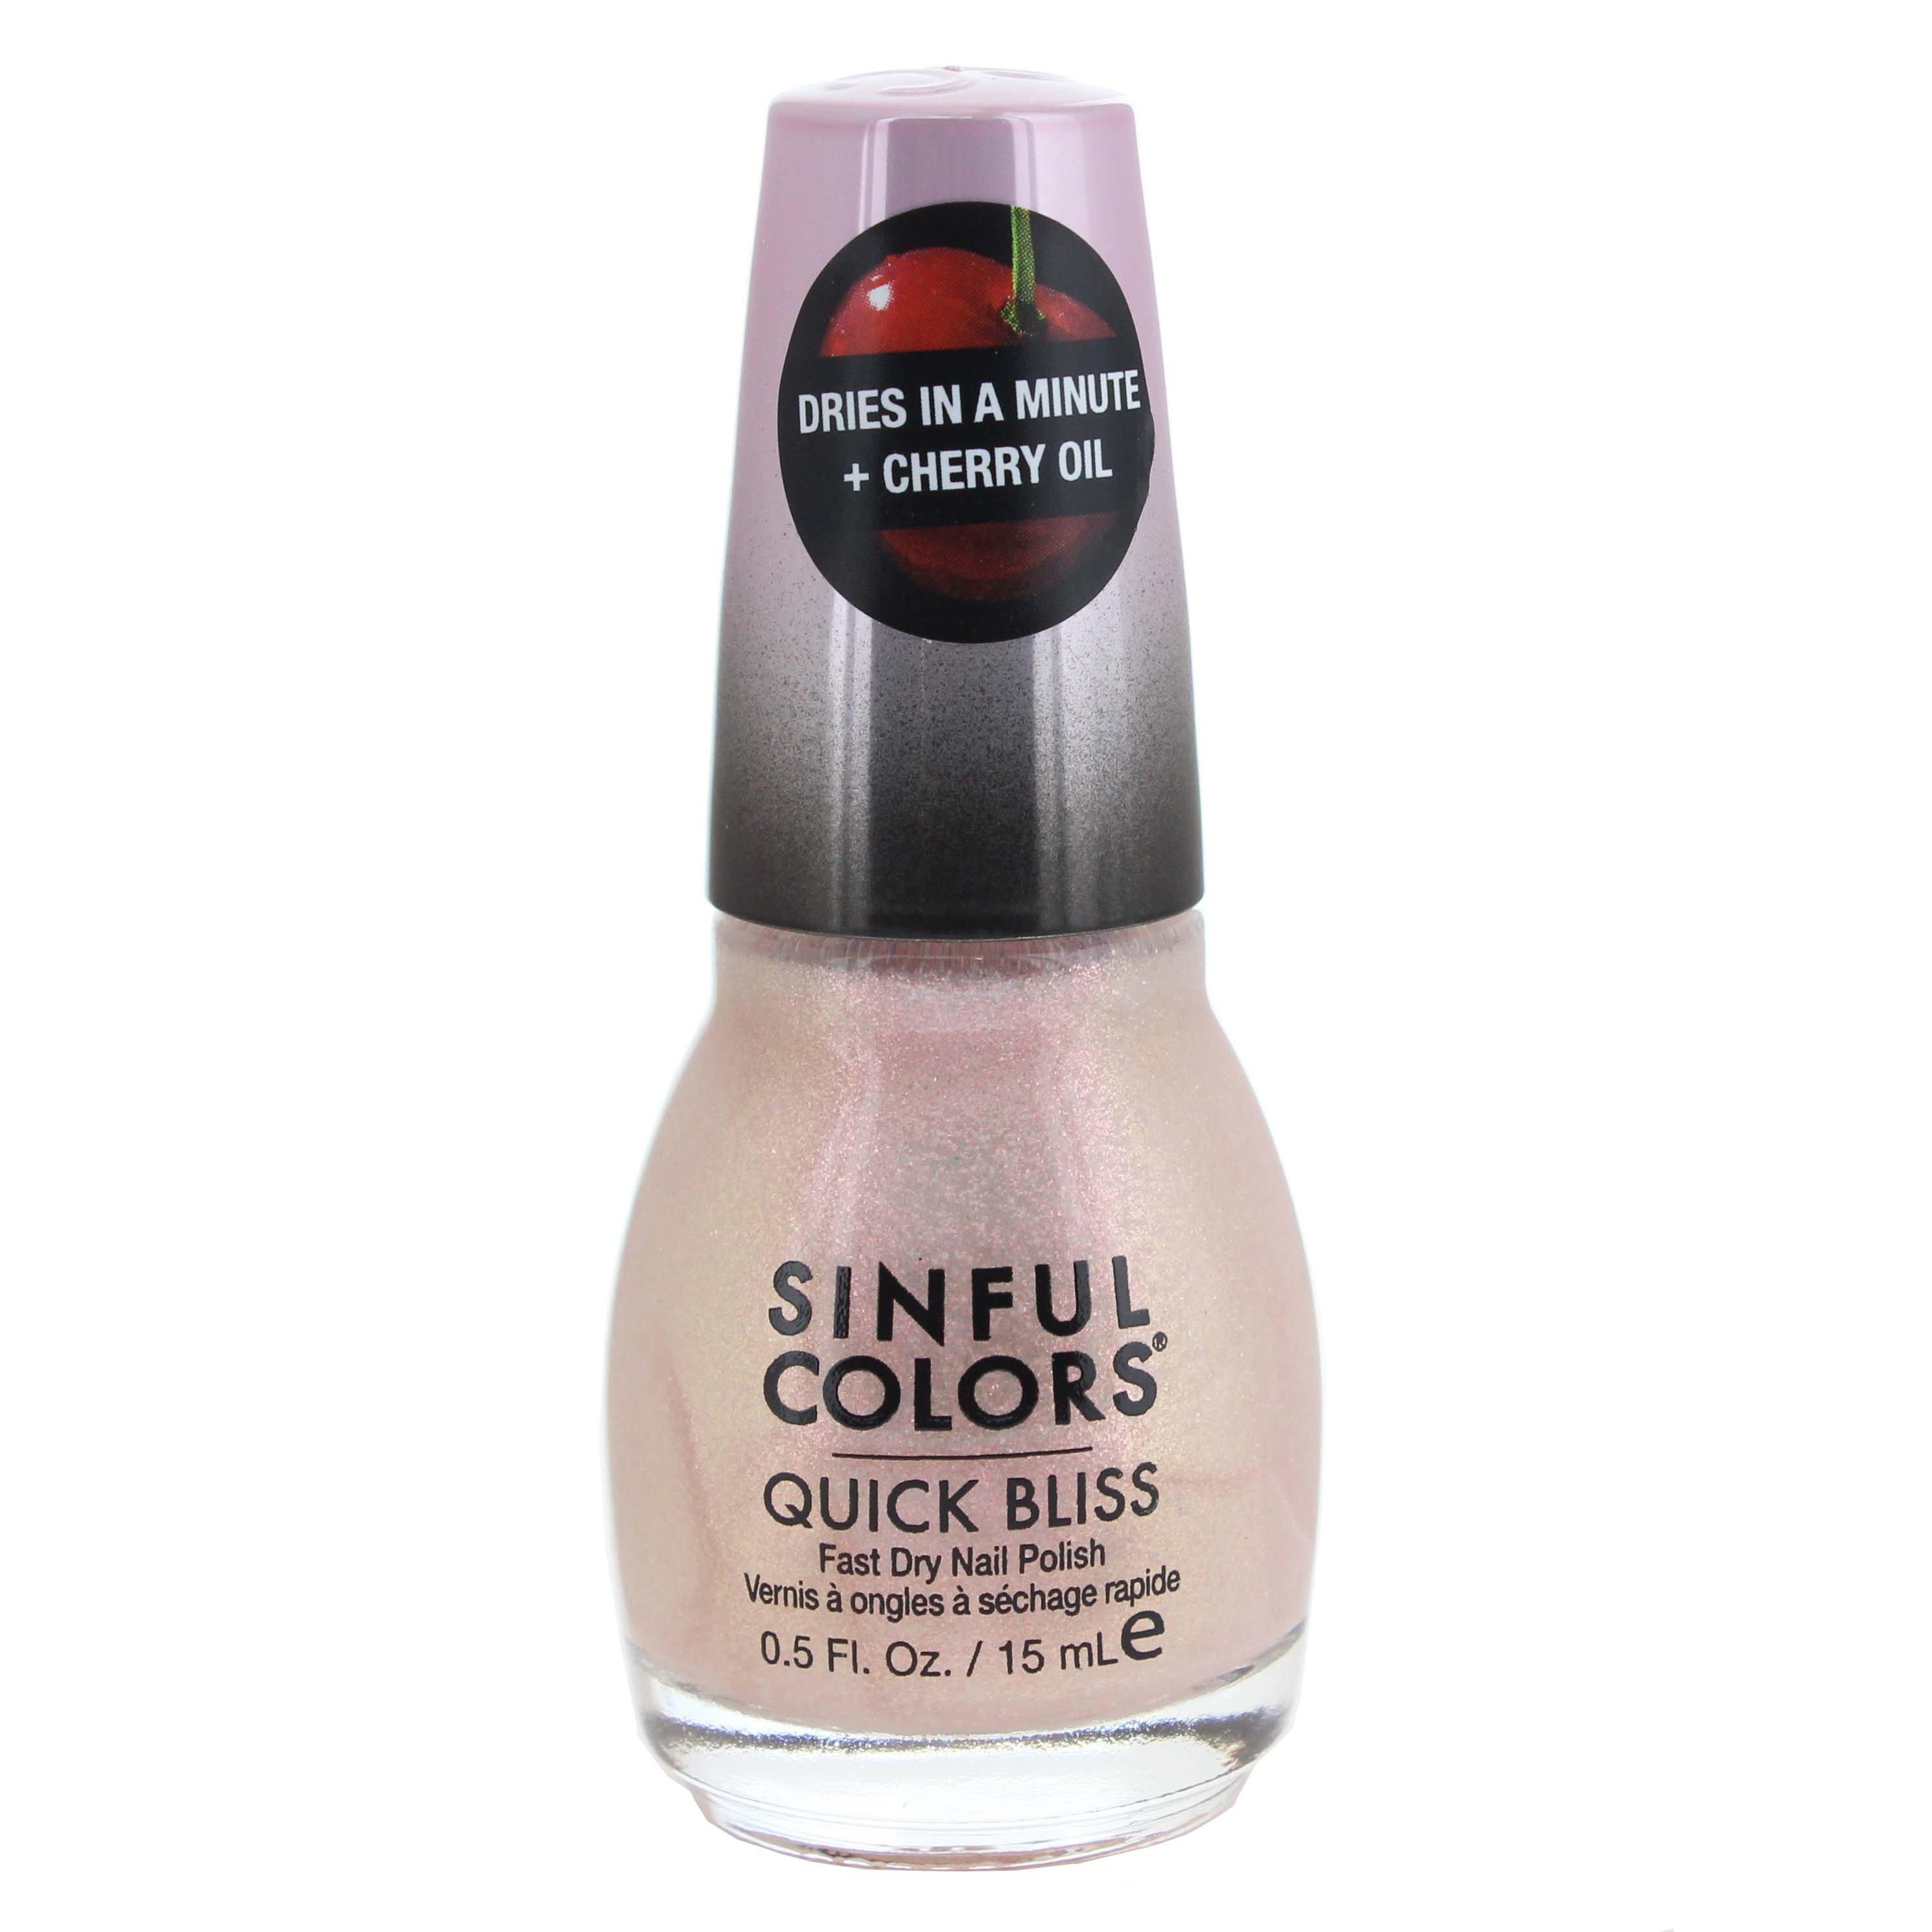 Sinful Colors Quick Bliss Ice Ice Cherry Nail Enamel Shop Nail Polish At H E B